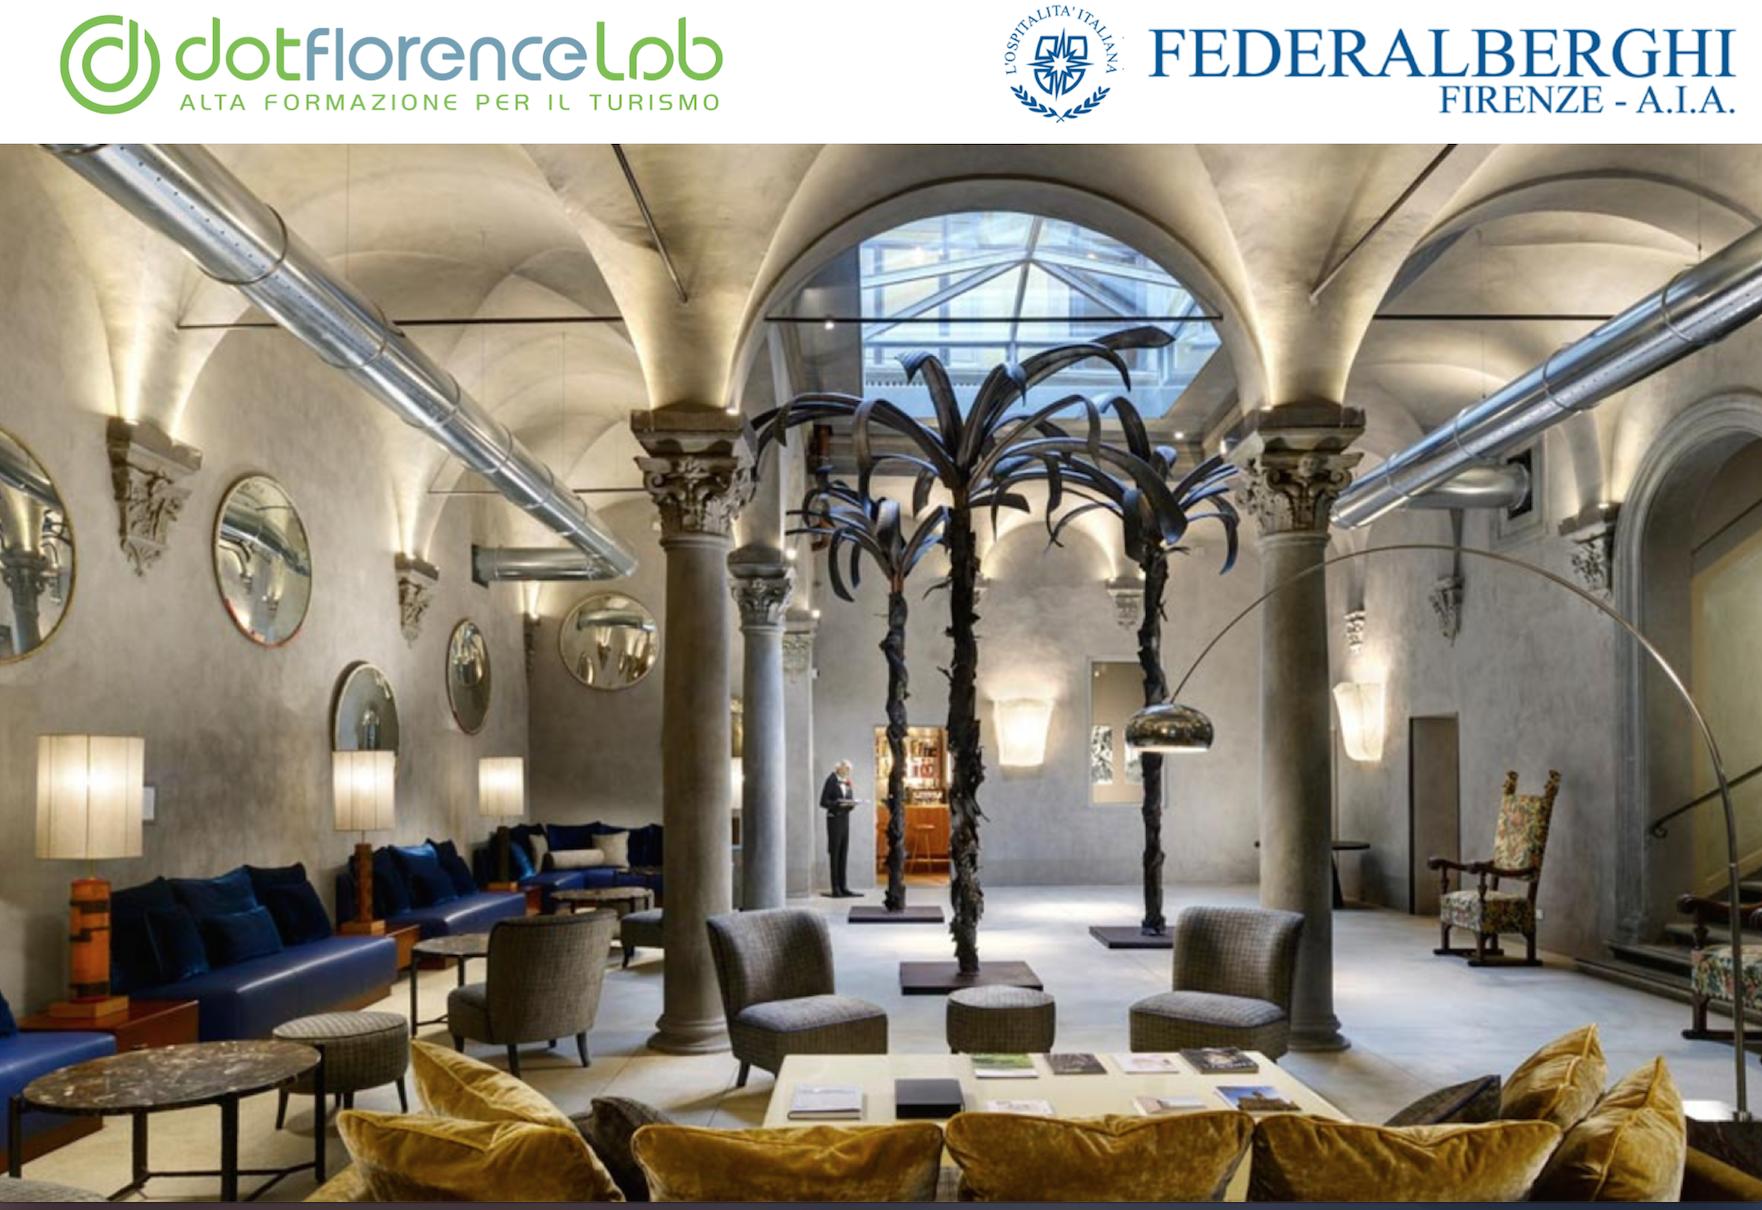 AIA Federalberghi - dotFlorence Lab